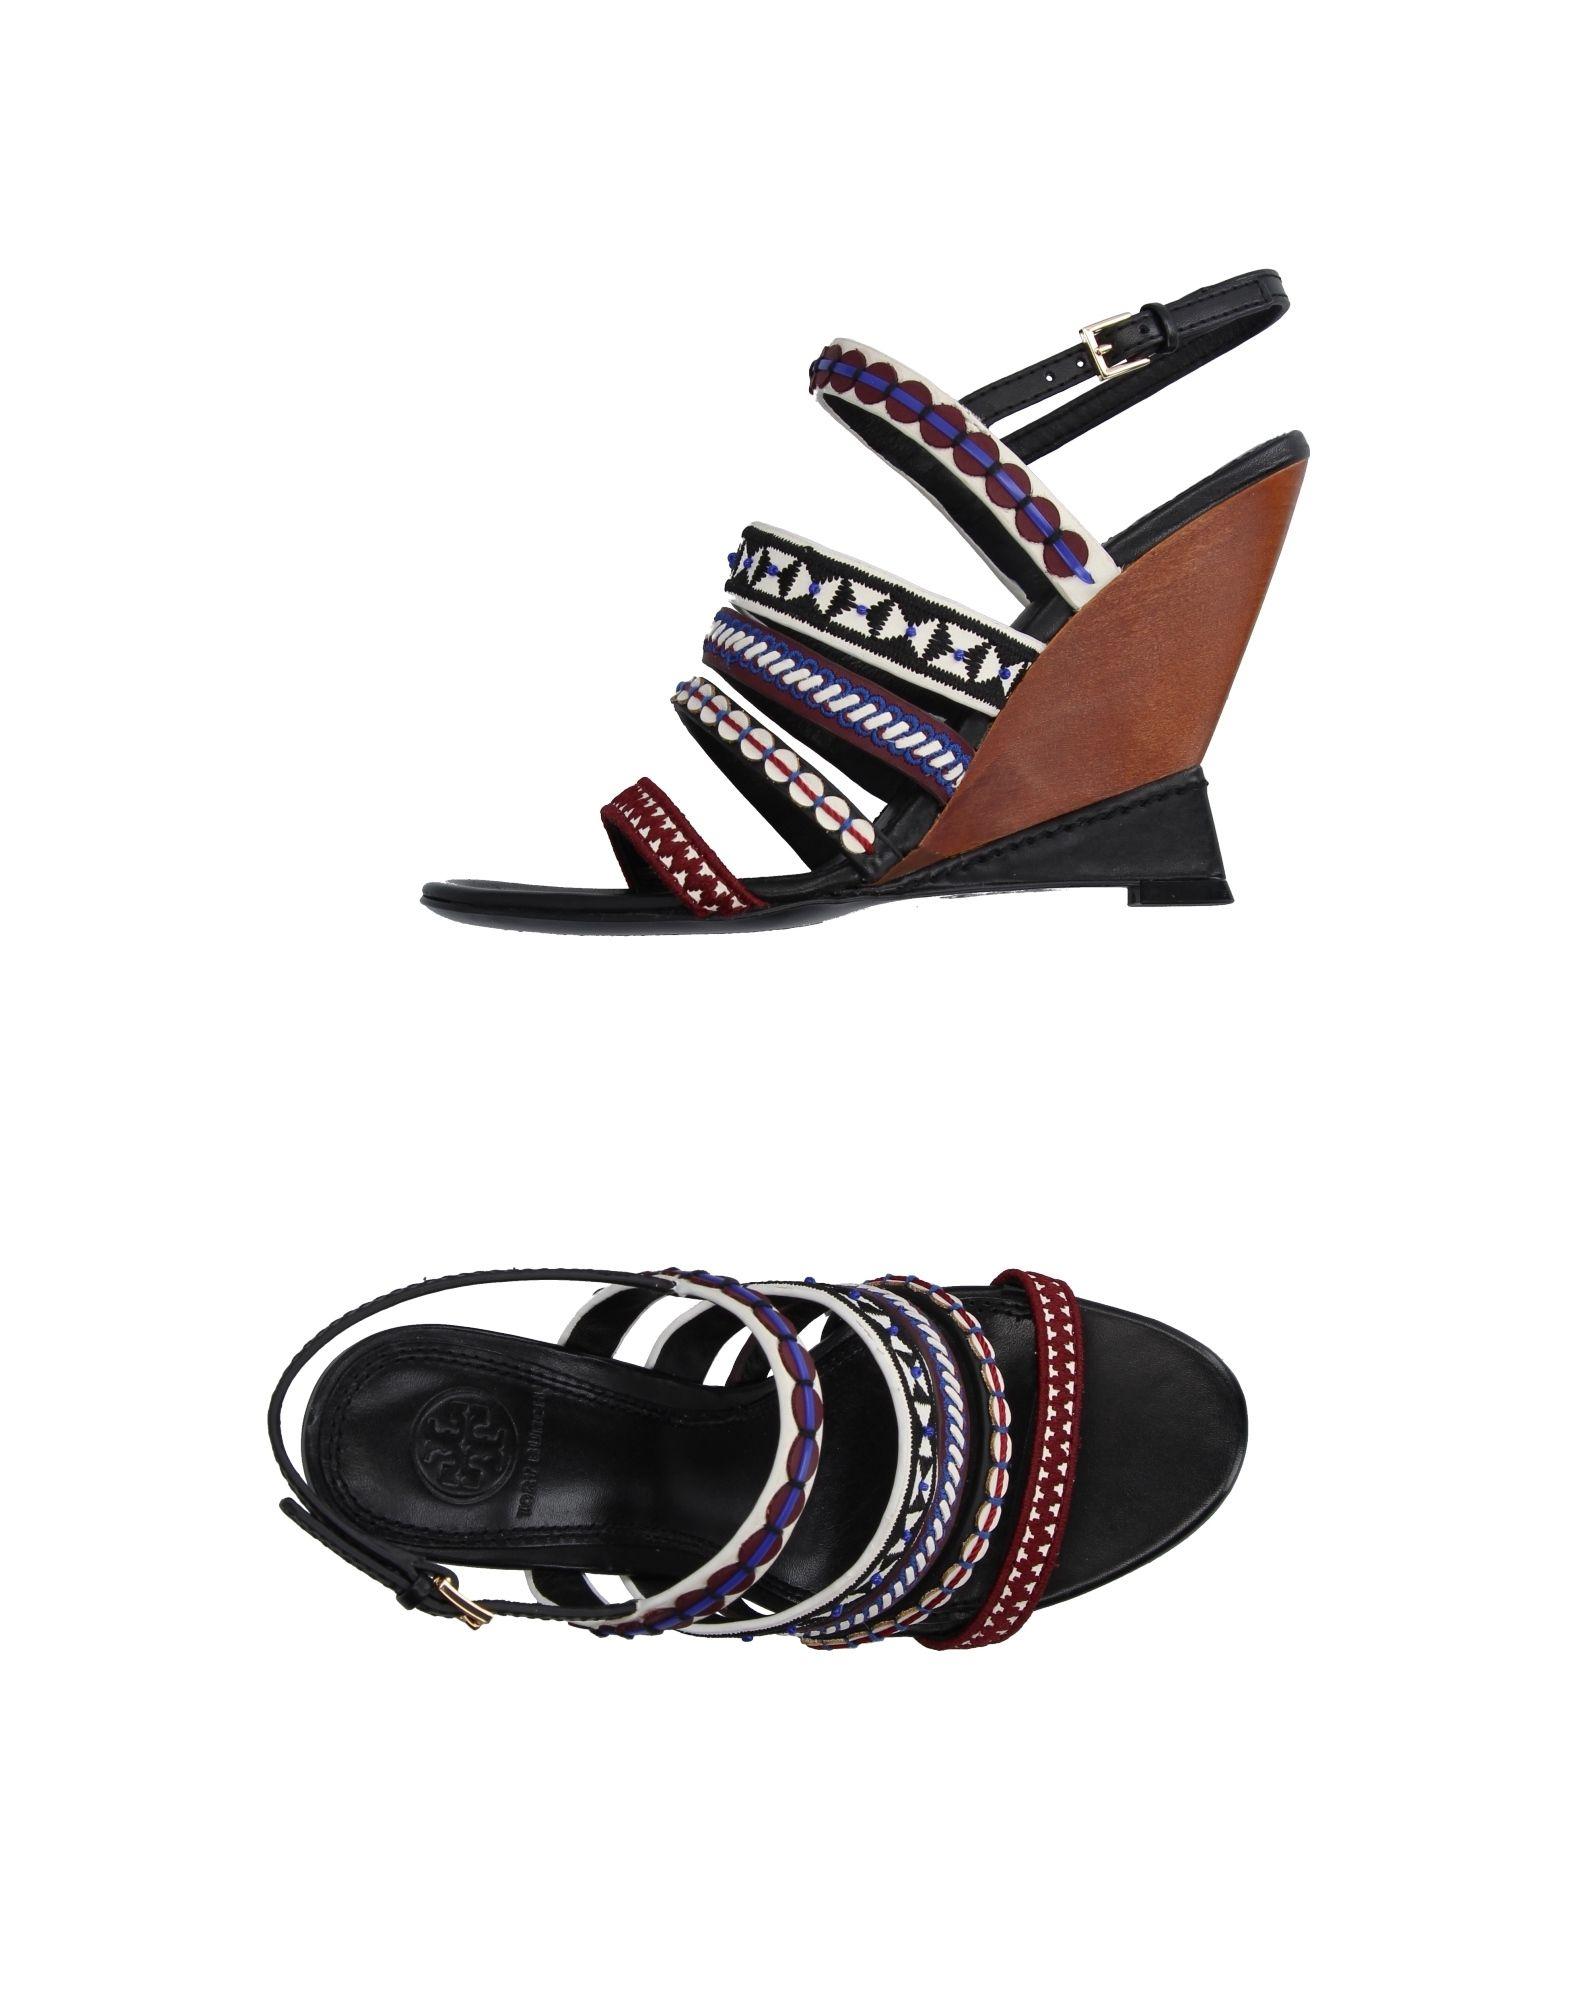 Tory Burch Sandalen Damen  11205769KNGut aussehende strapazierfähige Schuhe